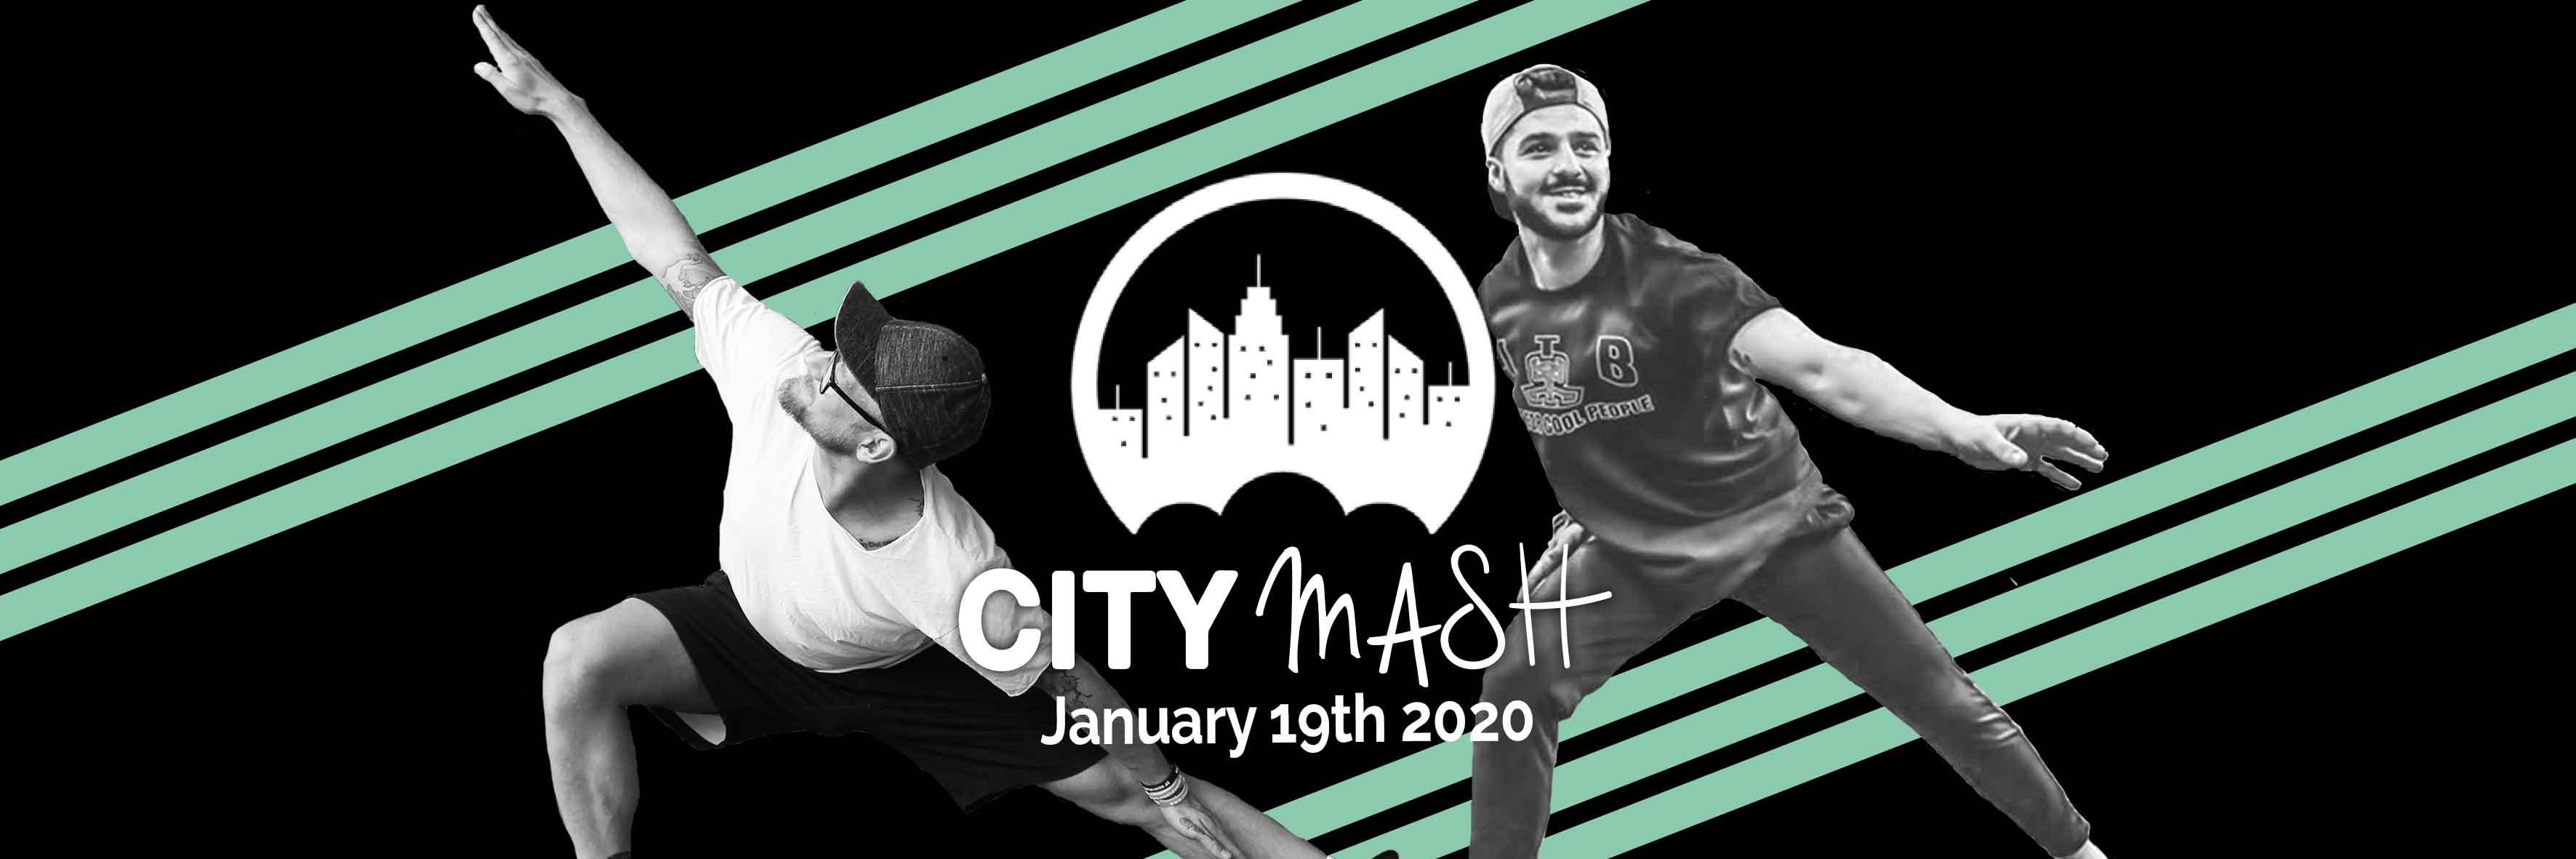 citymash19.1.2020